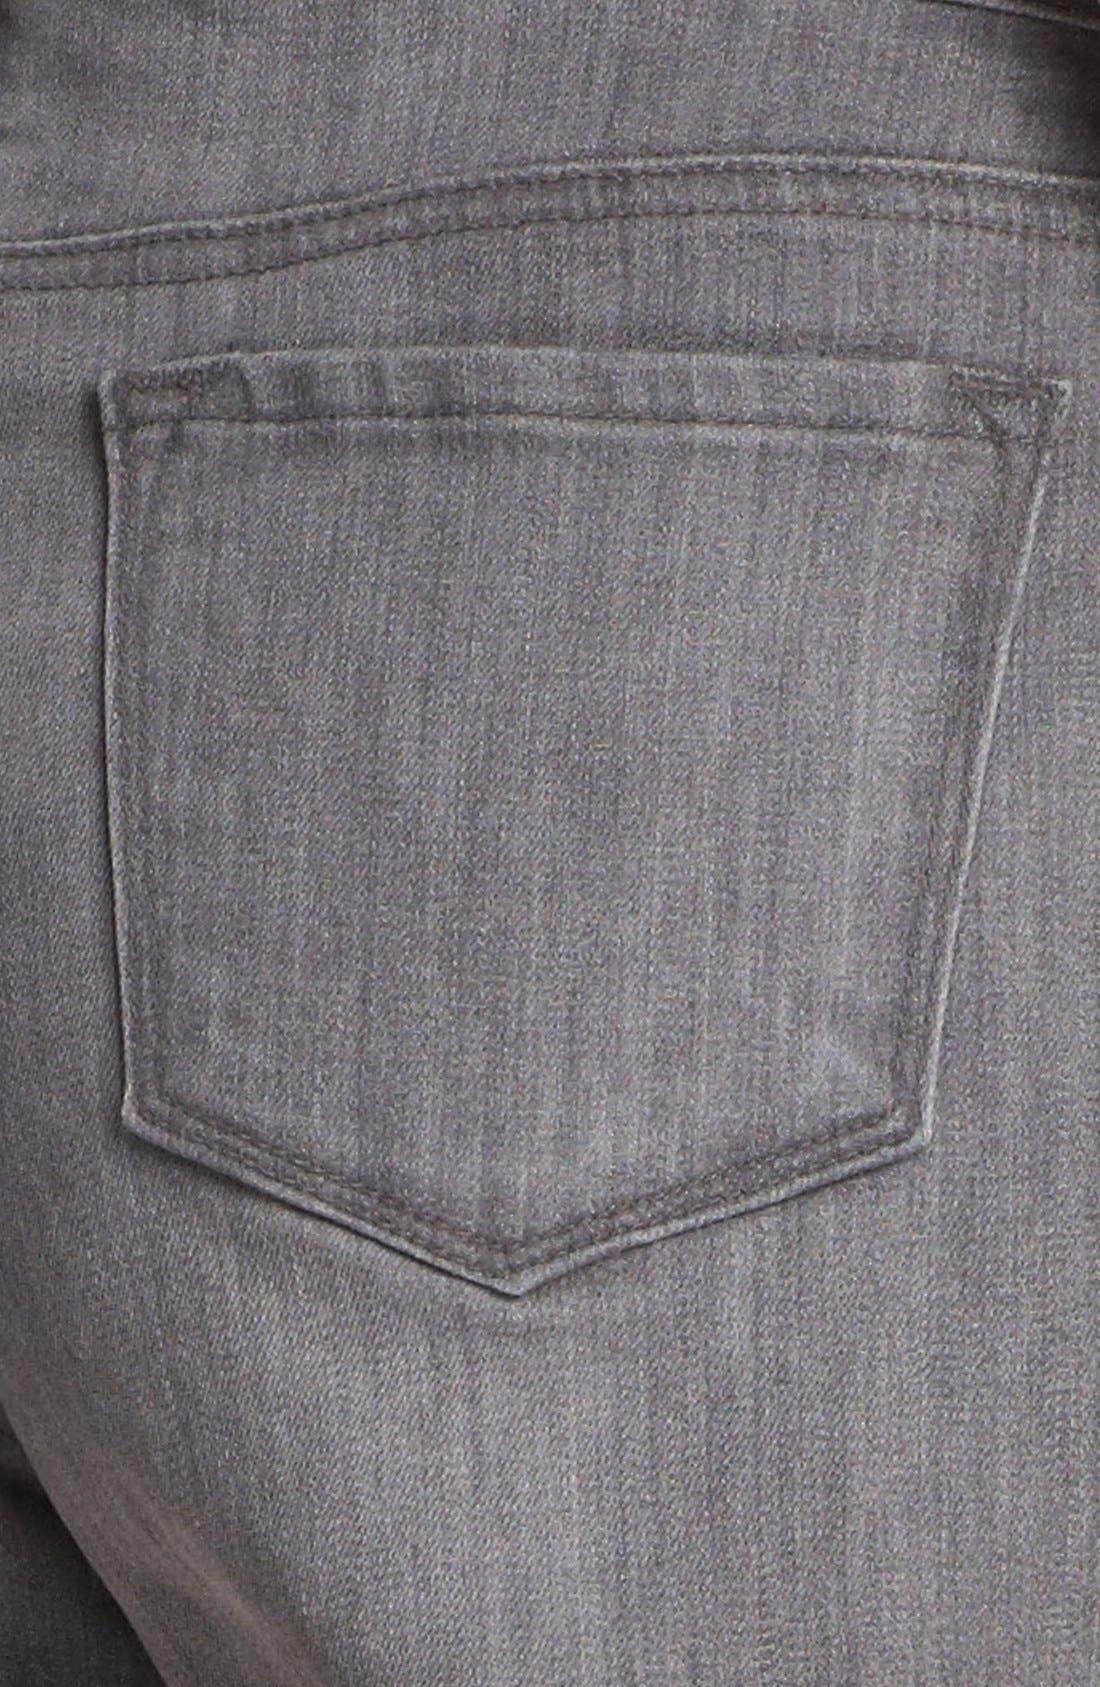 J BRAND,                             Cutoff Denim Shorts,                             Alternate thumbnail 3, color,                             020